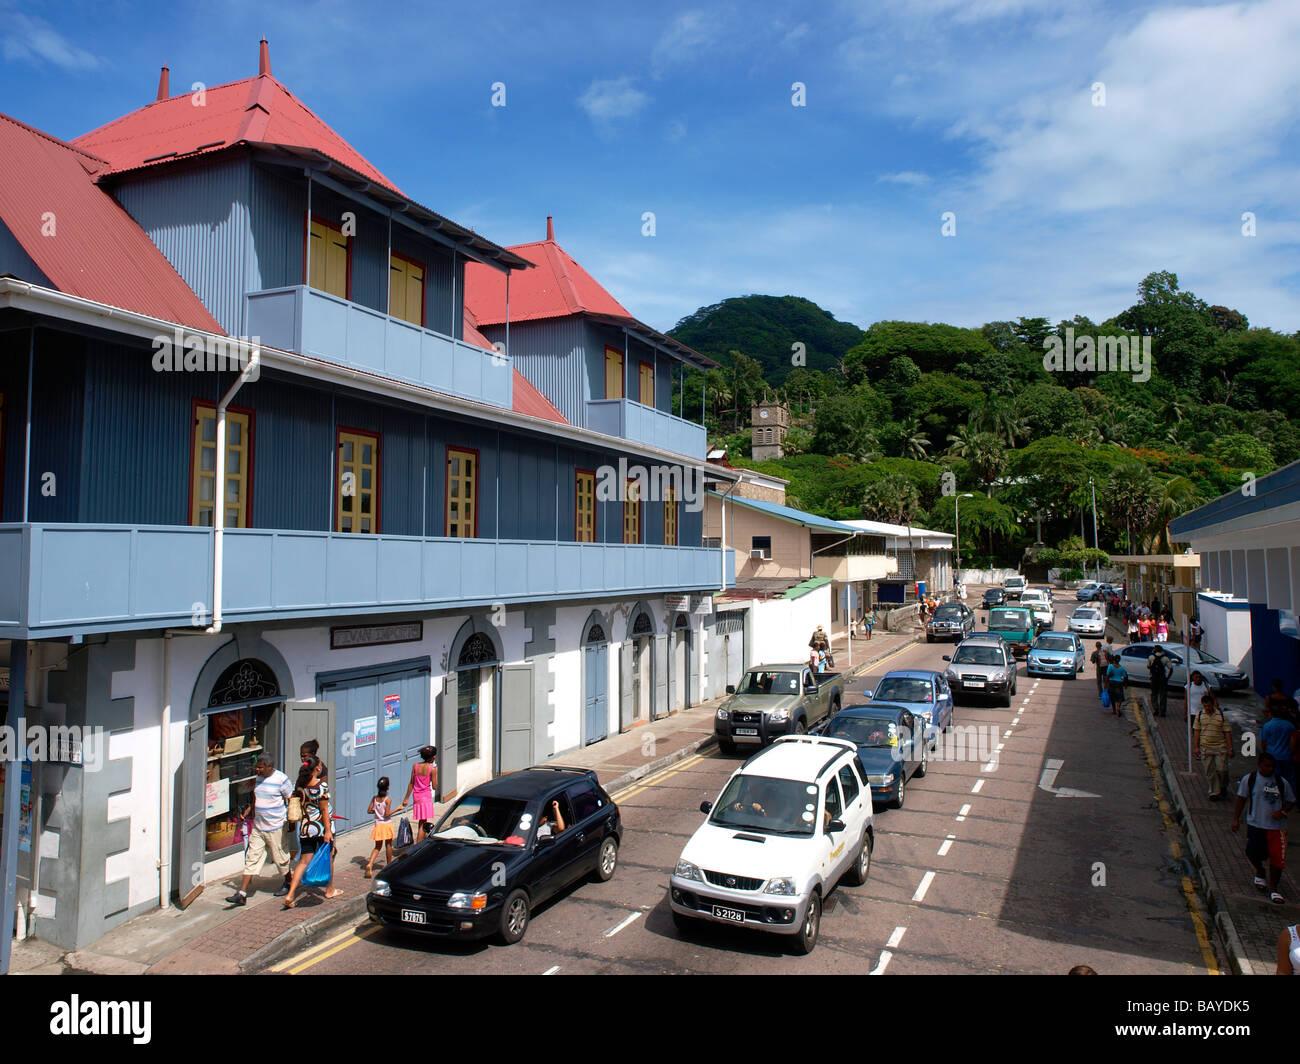 Albert Street, Victoria, Mahé, Seychelles - Stock Image